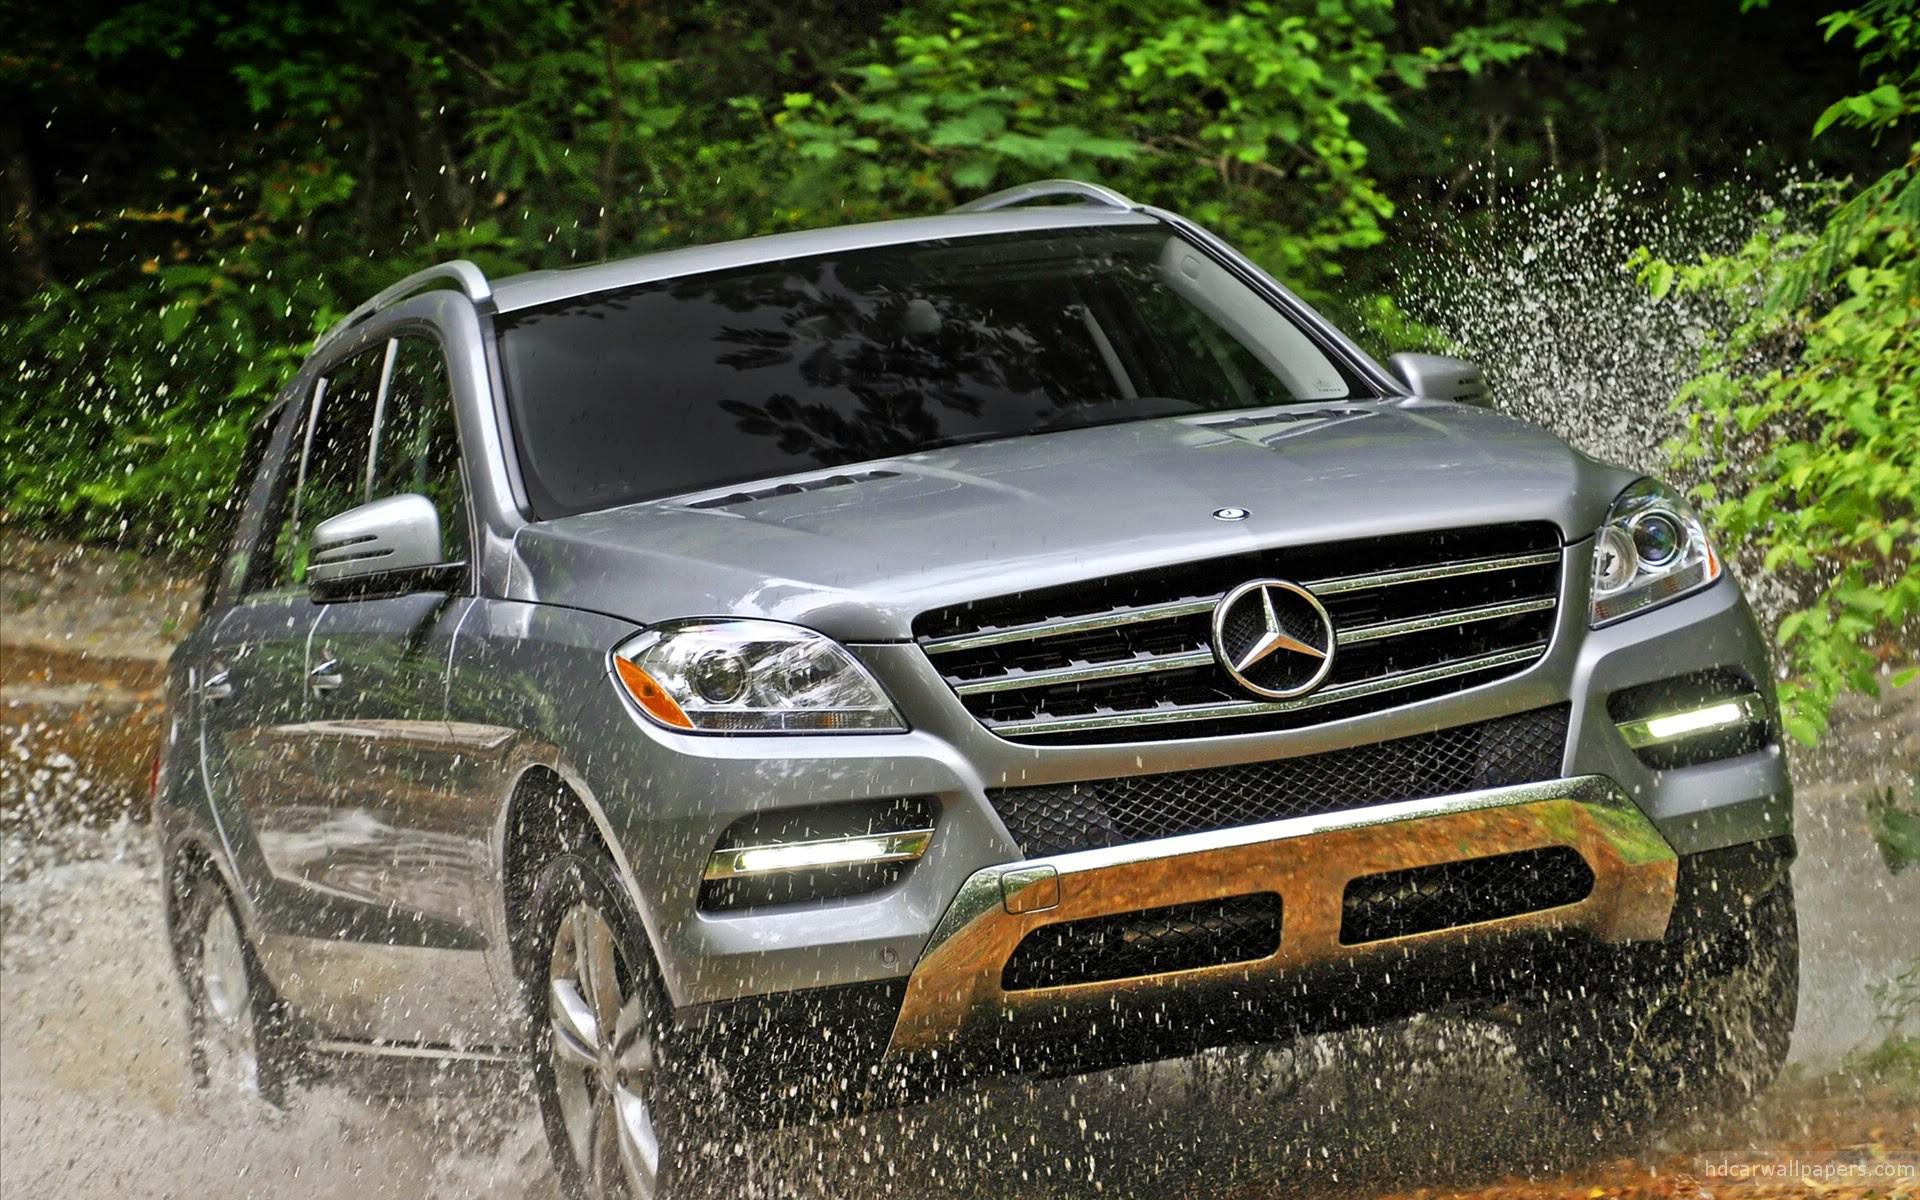 2012 Mercedes Benz ML350 Wallpaper | HD Car Wallpapers ...